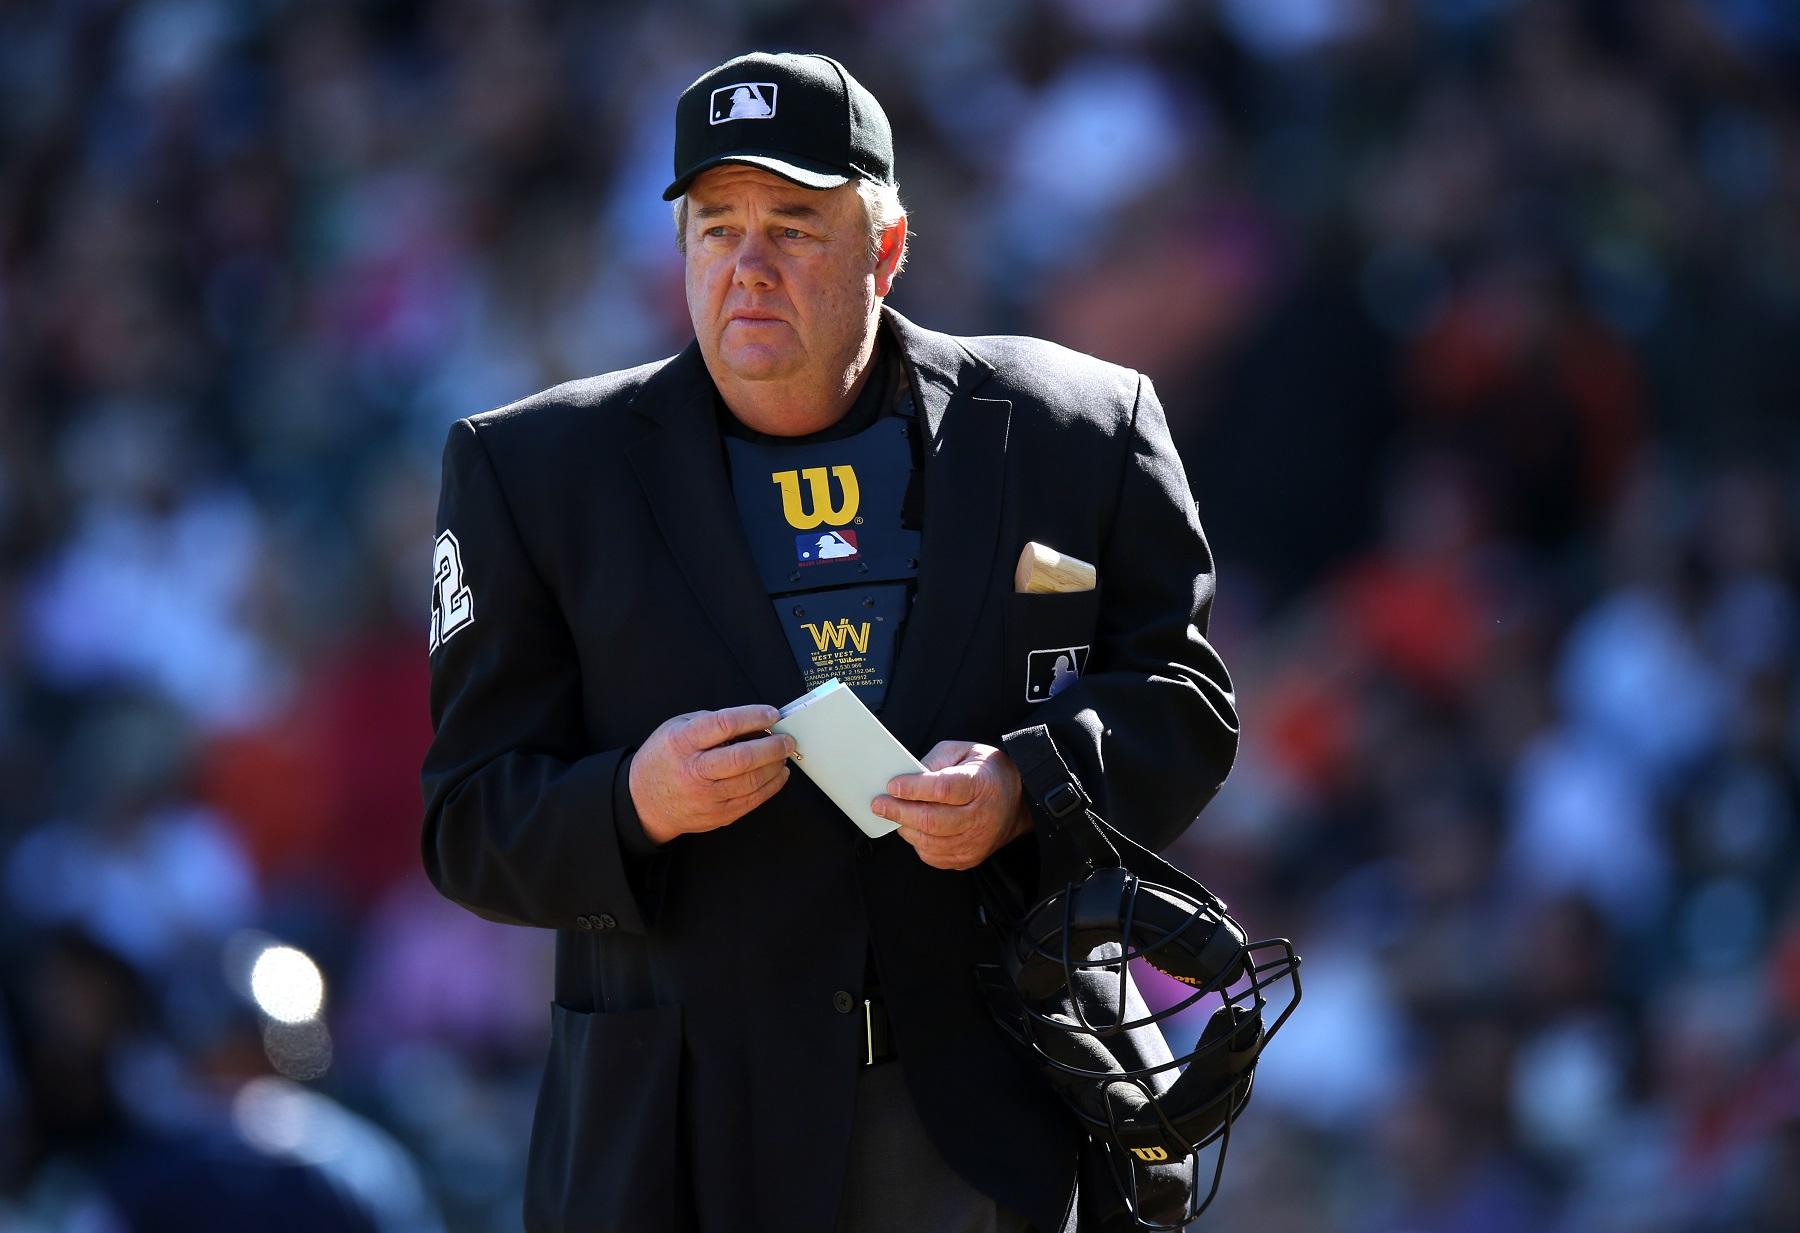 Umpire Joe West